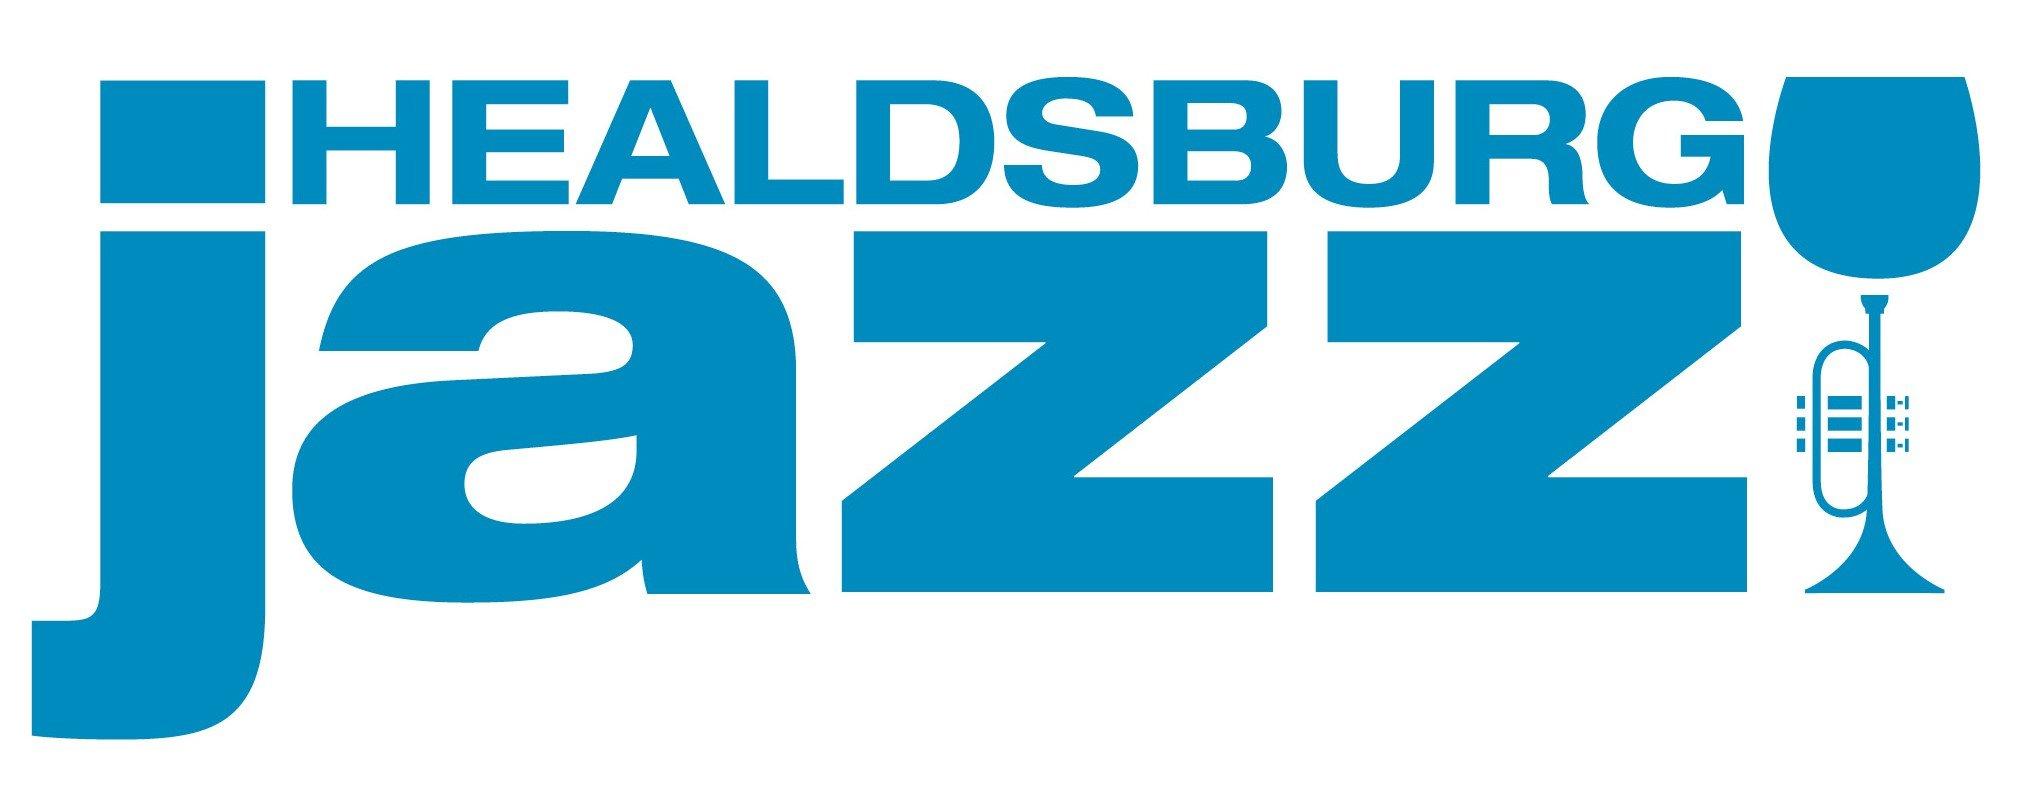 HealdsburgJazz.org